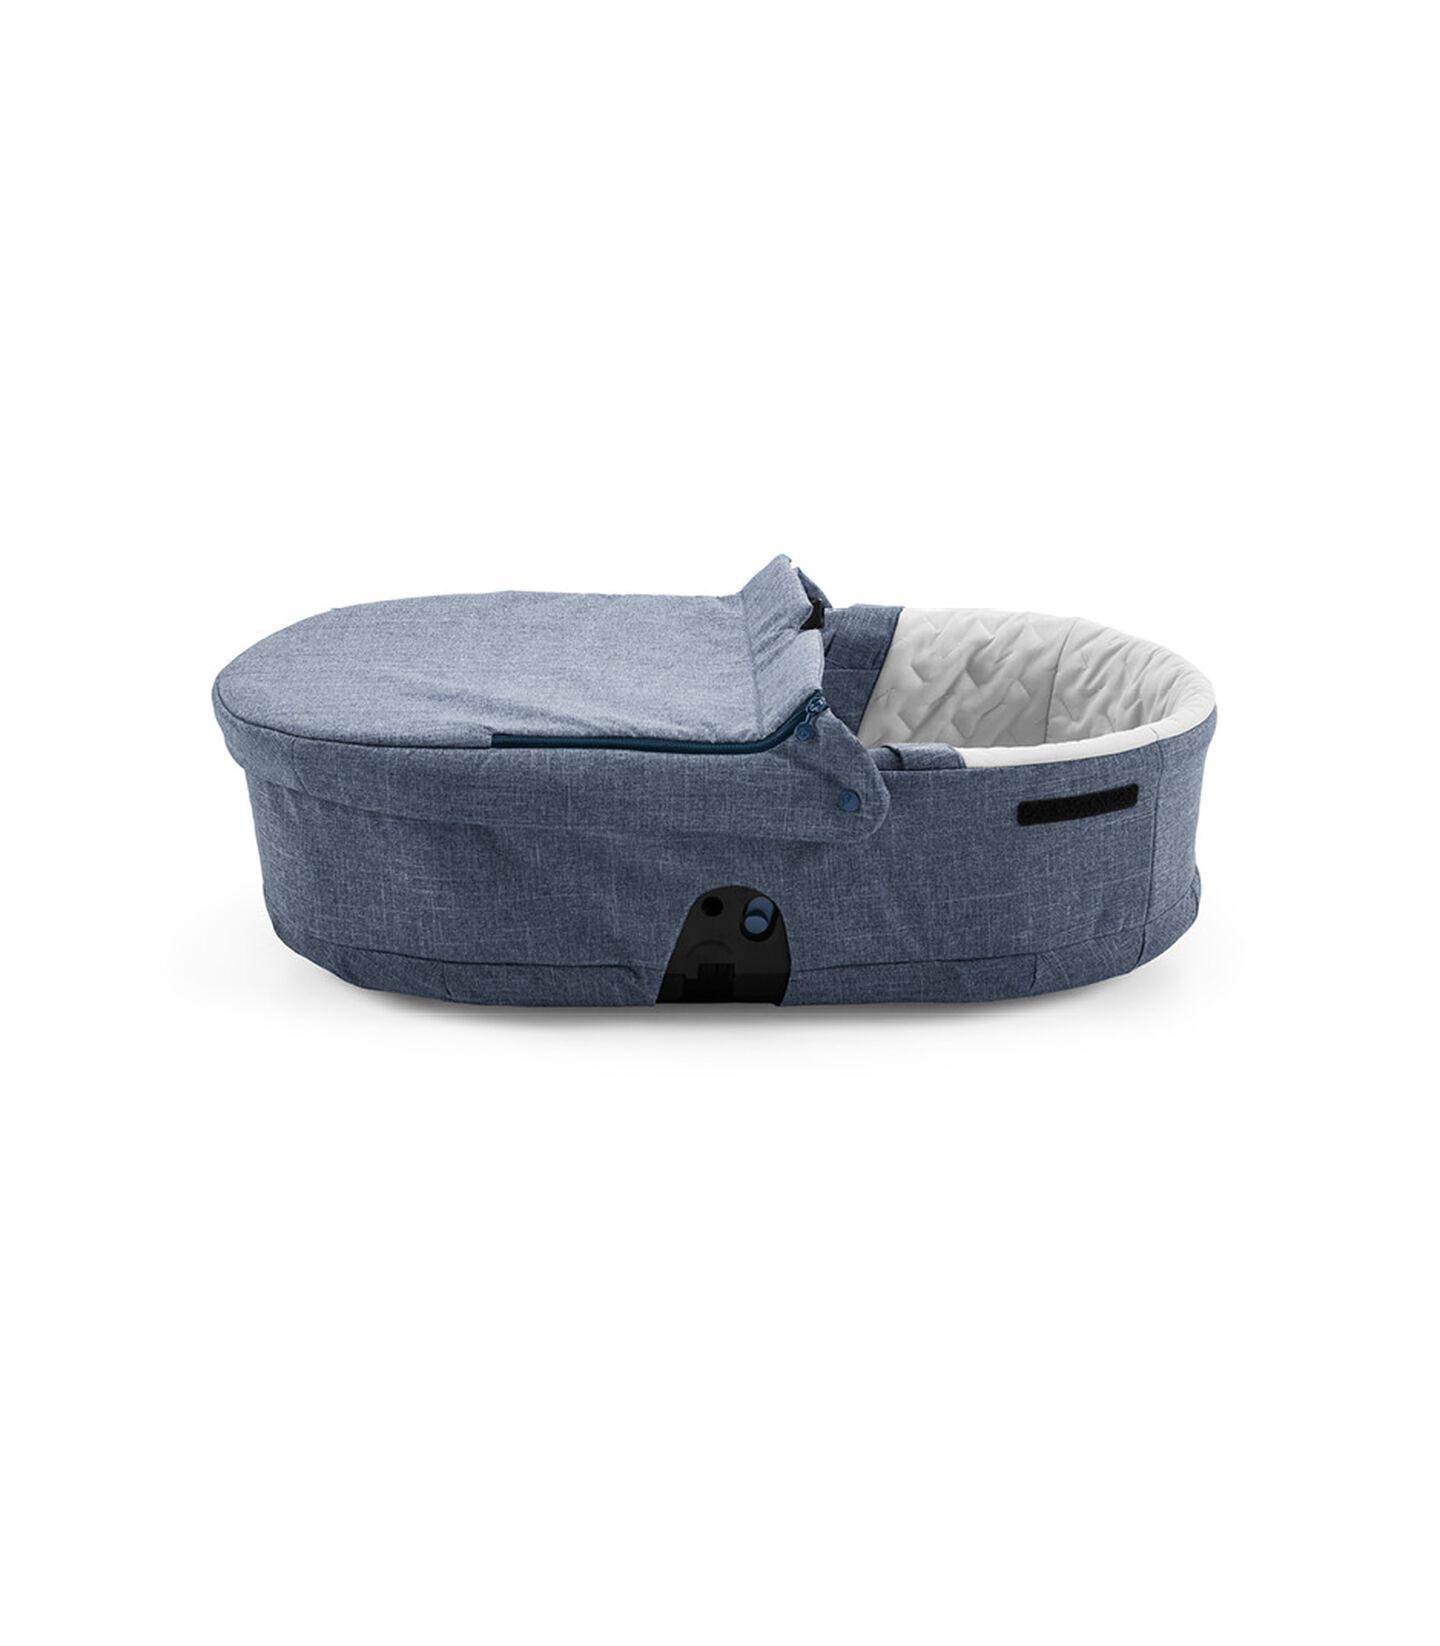 Stokke® Beat Carry Cot Blue Melange, Blu Melange, mainview view 1